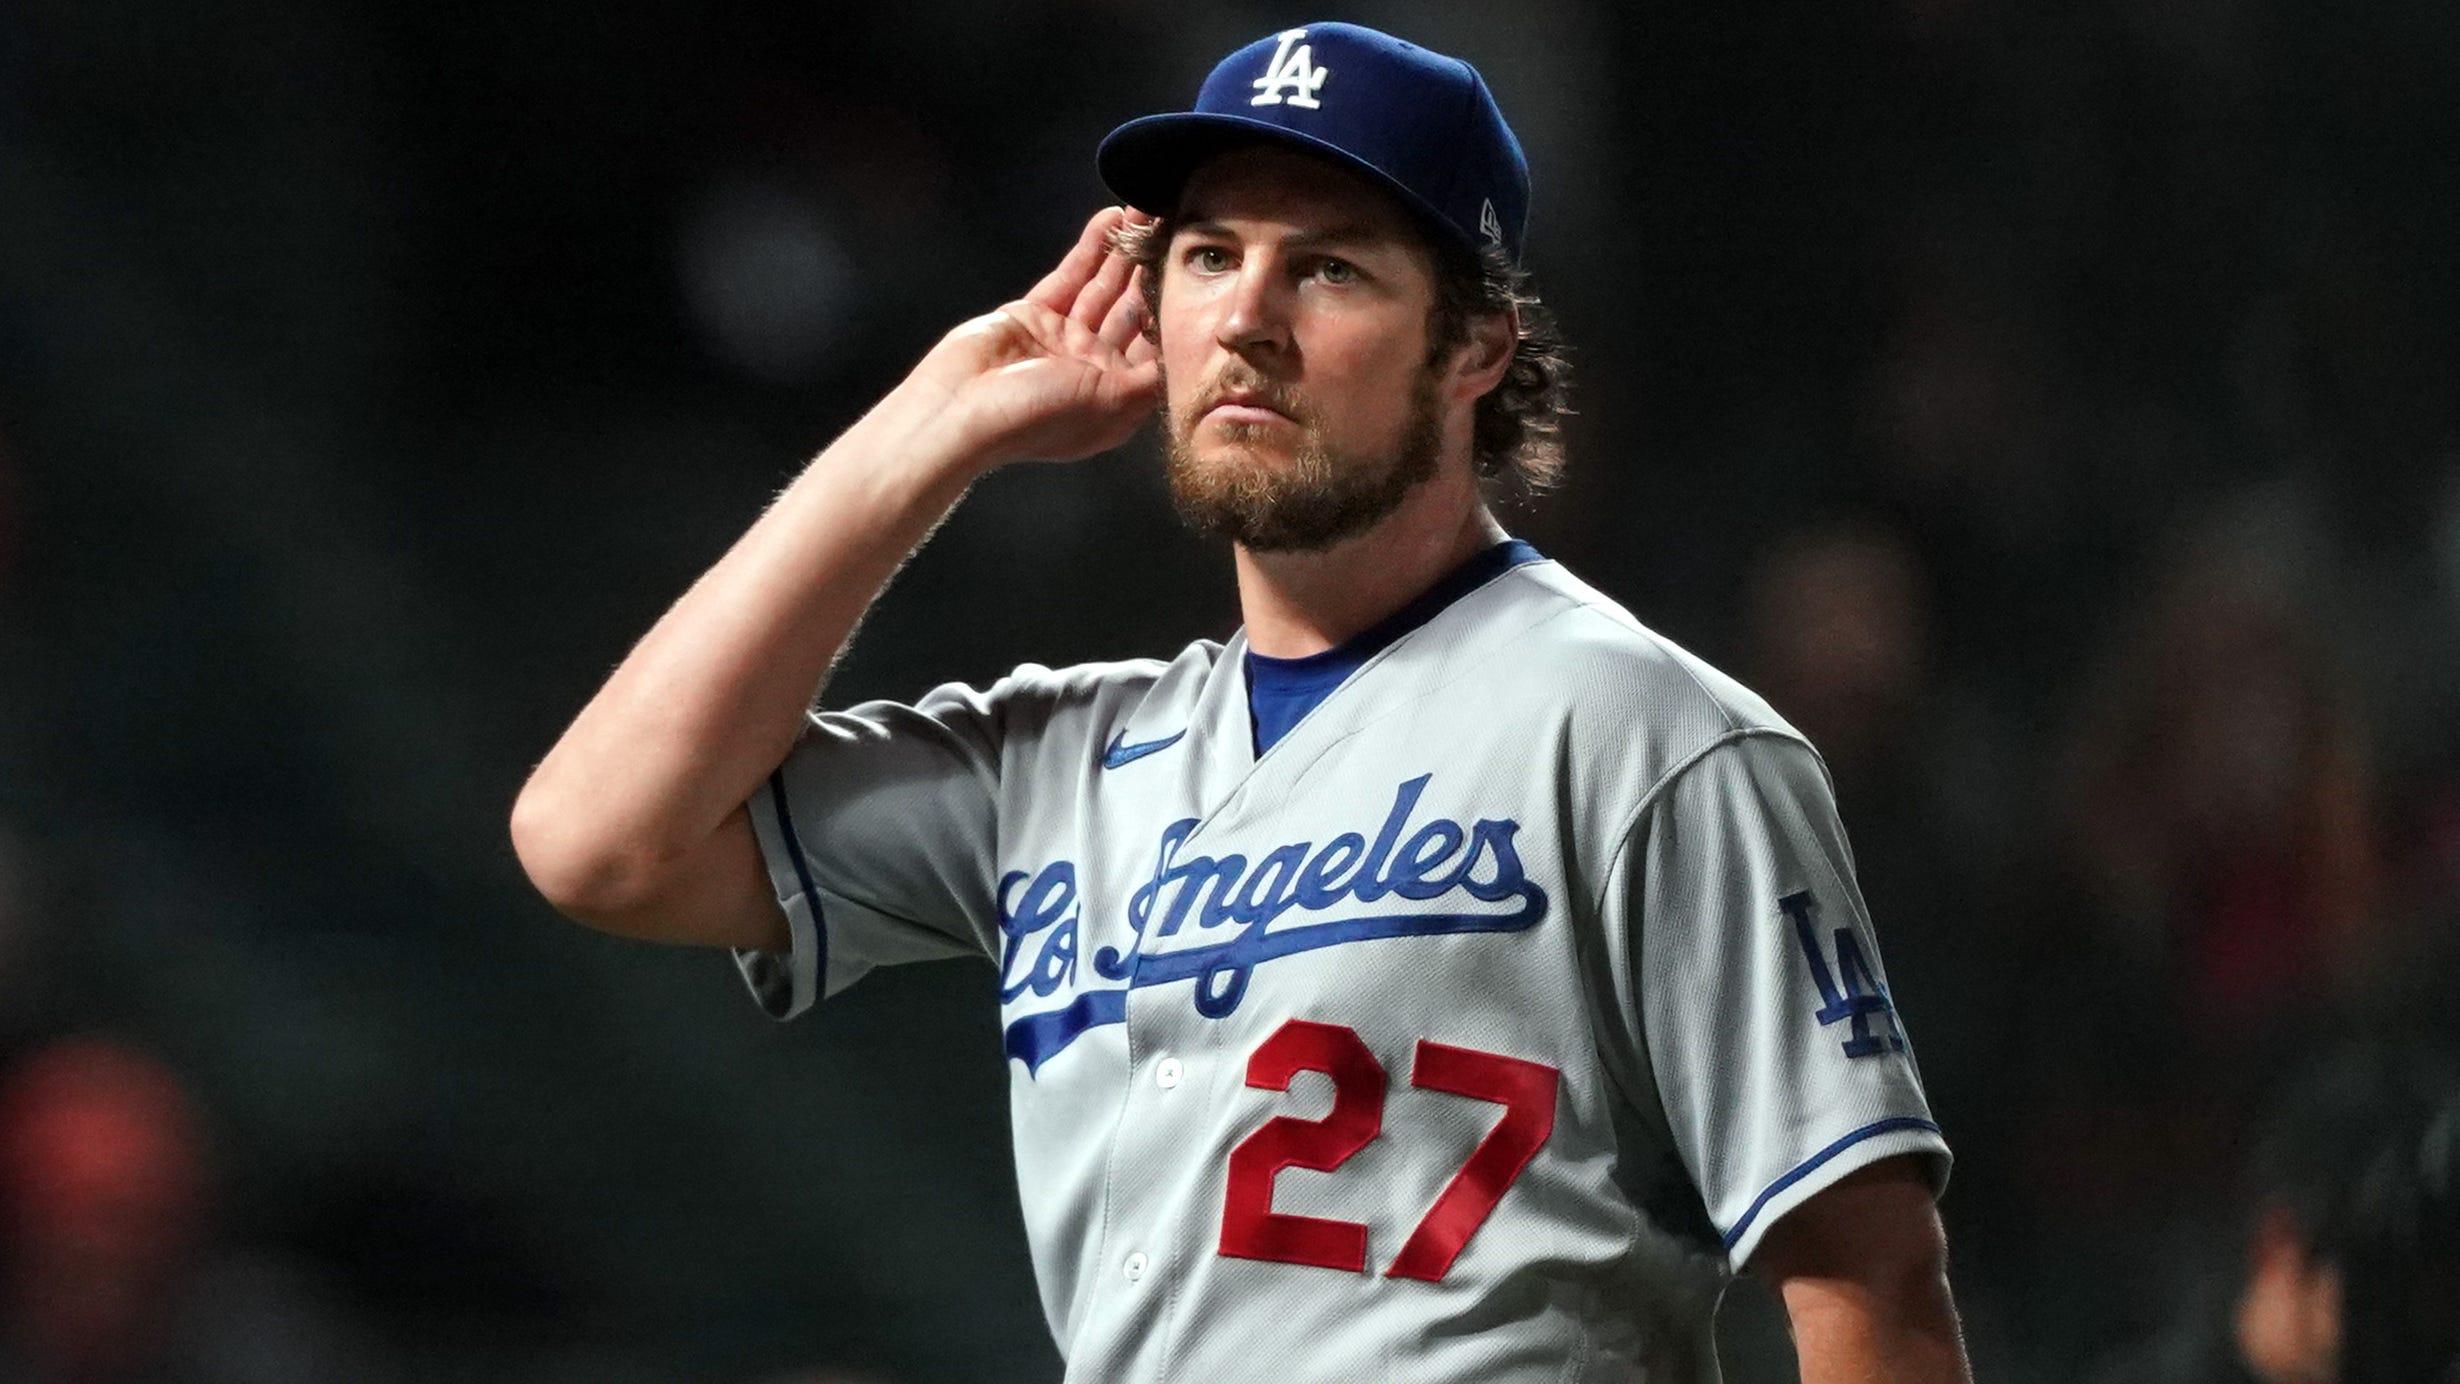 MLB's foreign substance problem: Baseball's next big scandal?